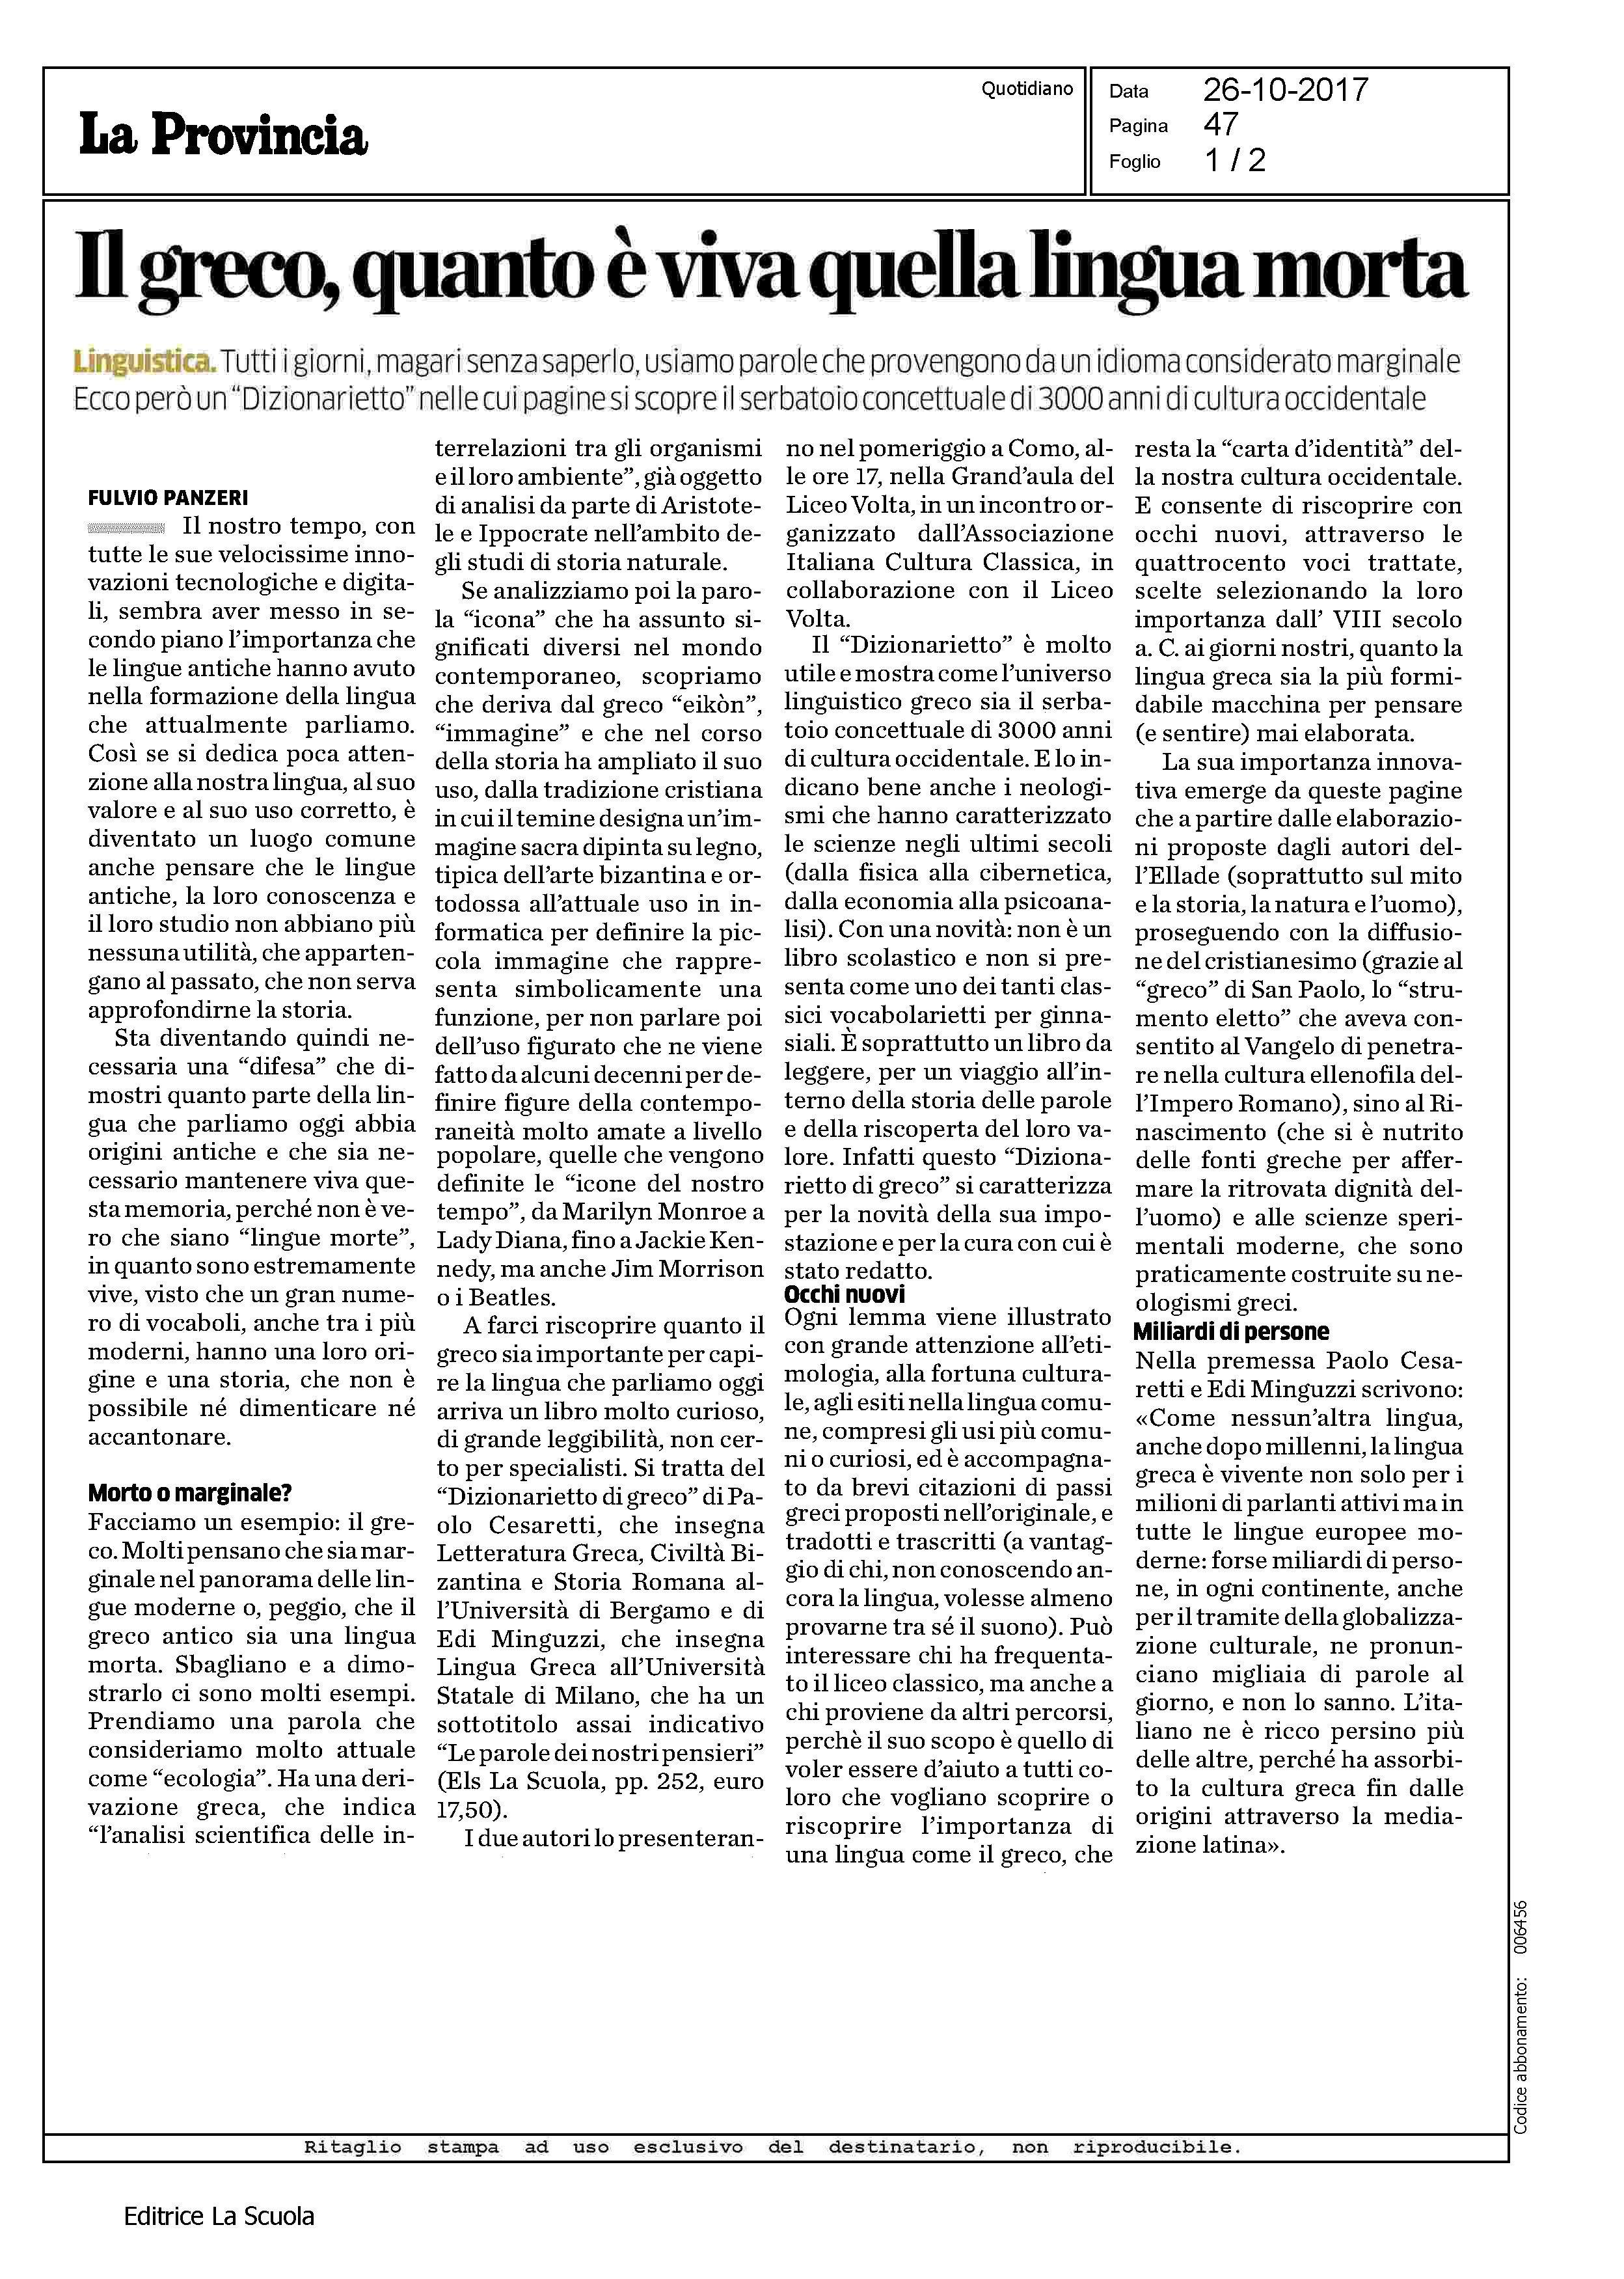 Els PROVINCIA COMO LECCO SONDRIO 26 10 2